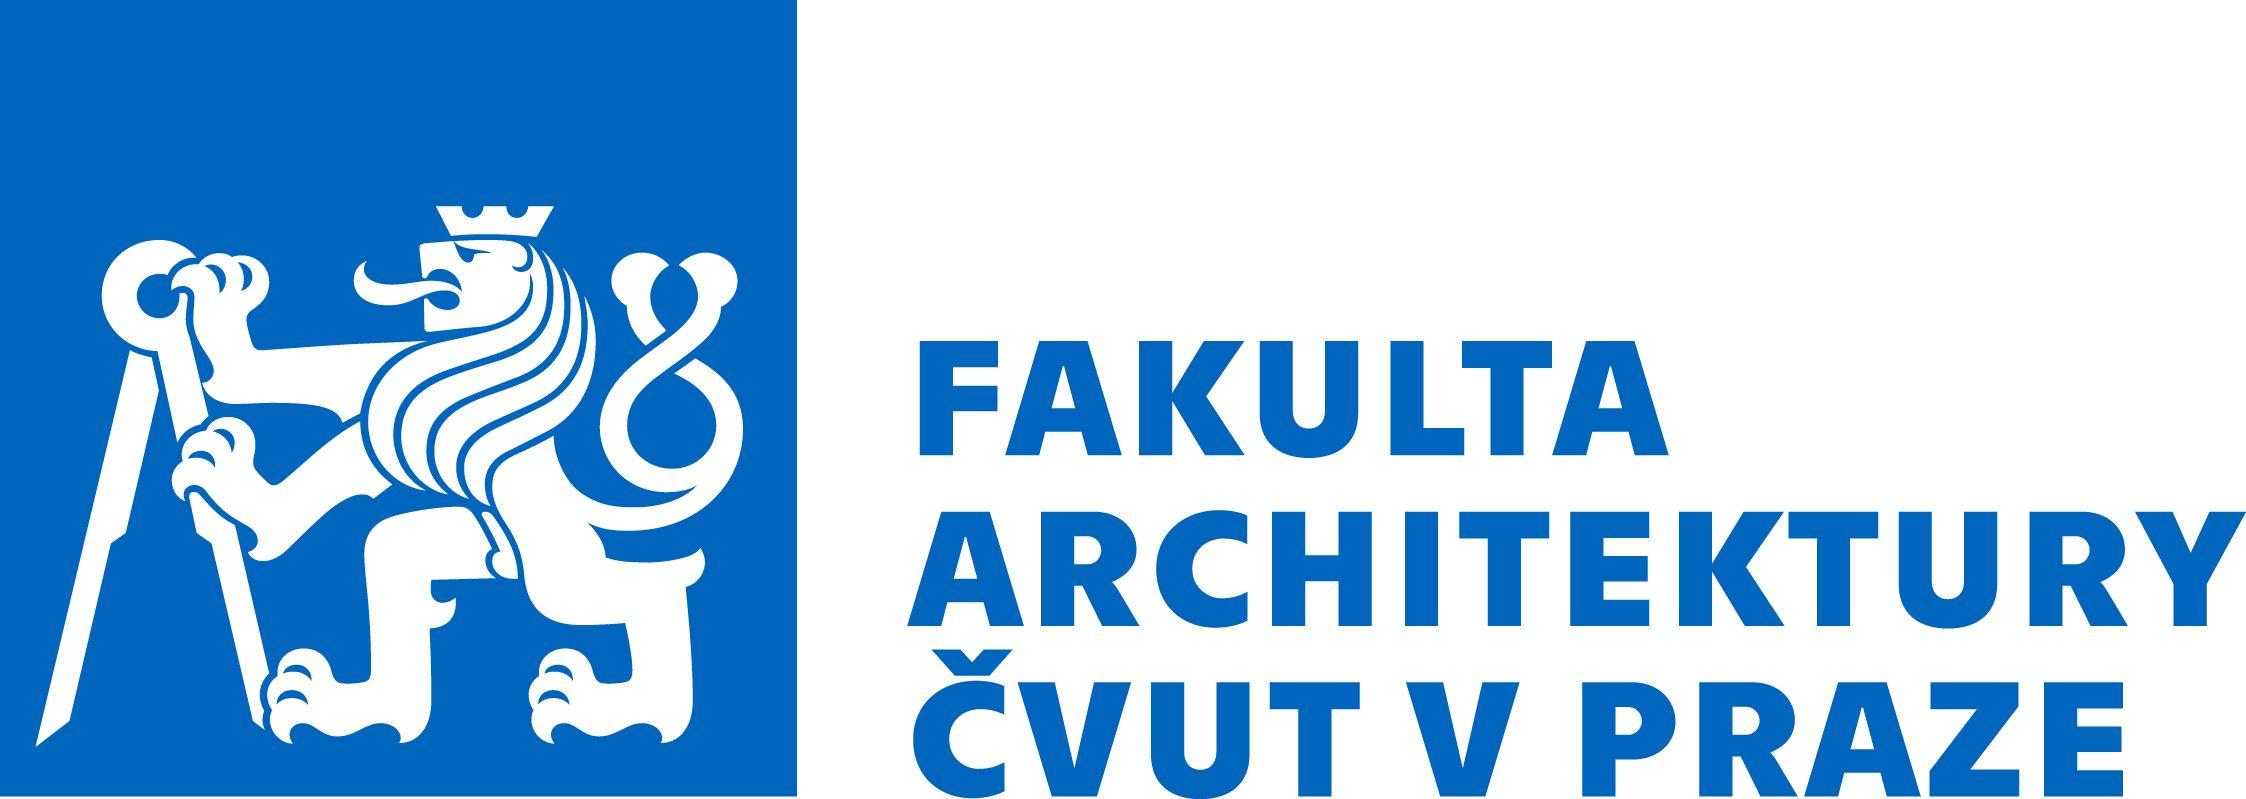 ČVUT - Fakulta architektury